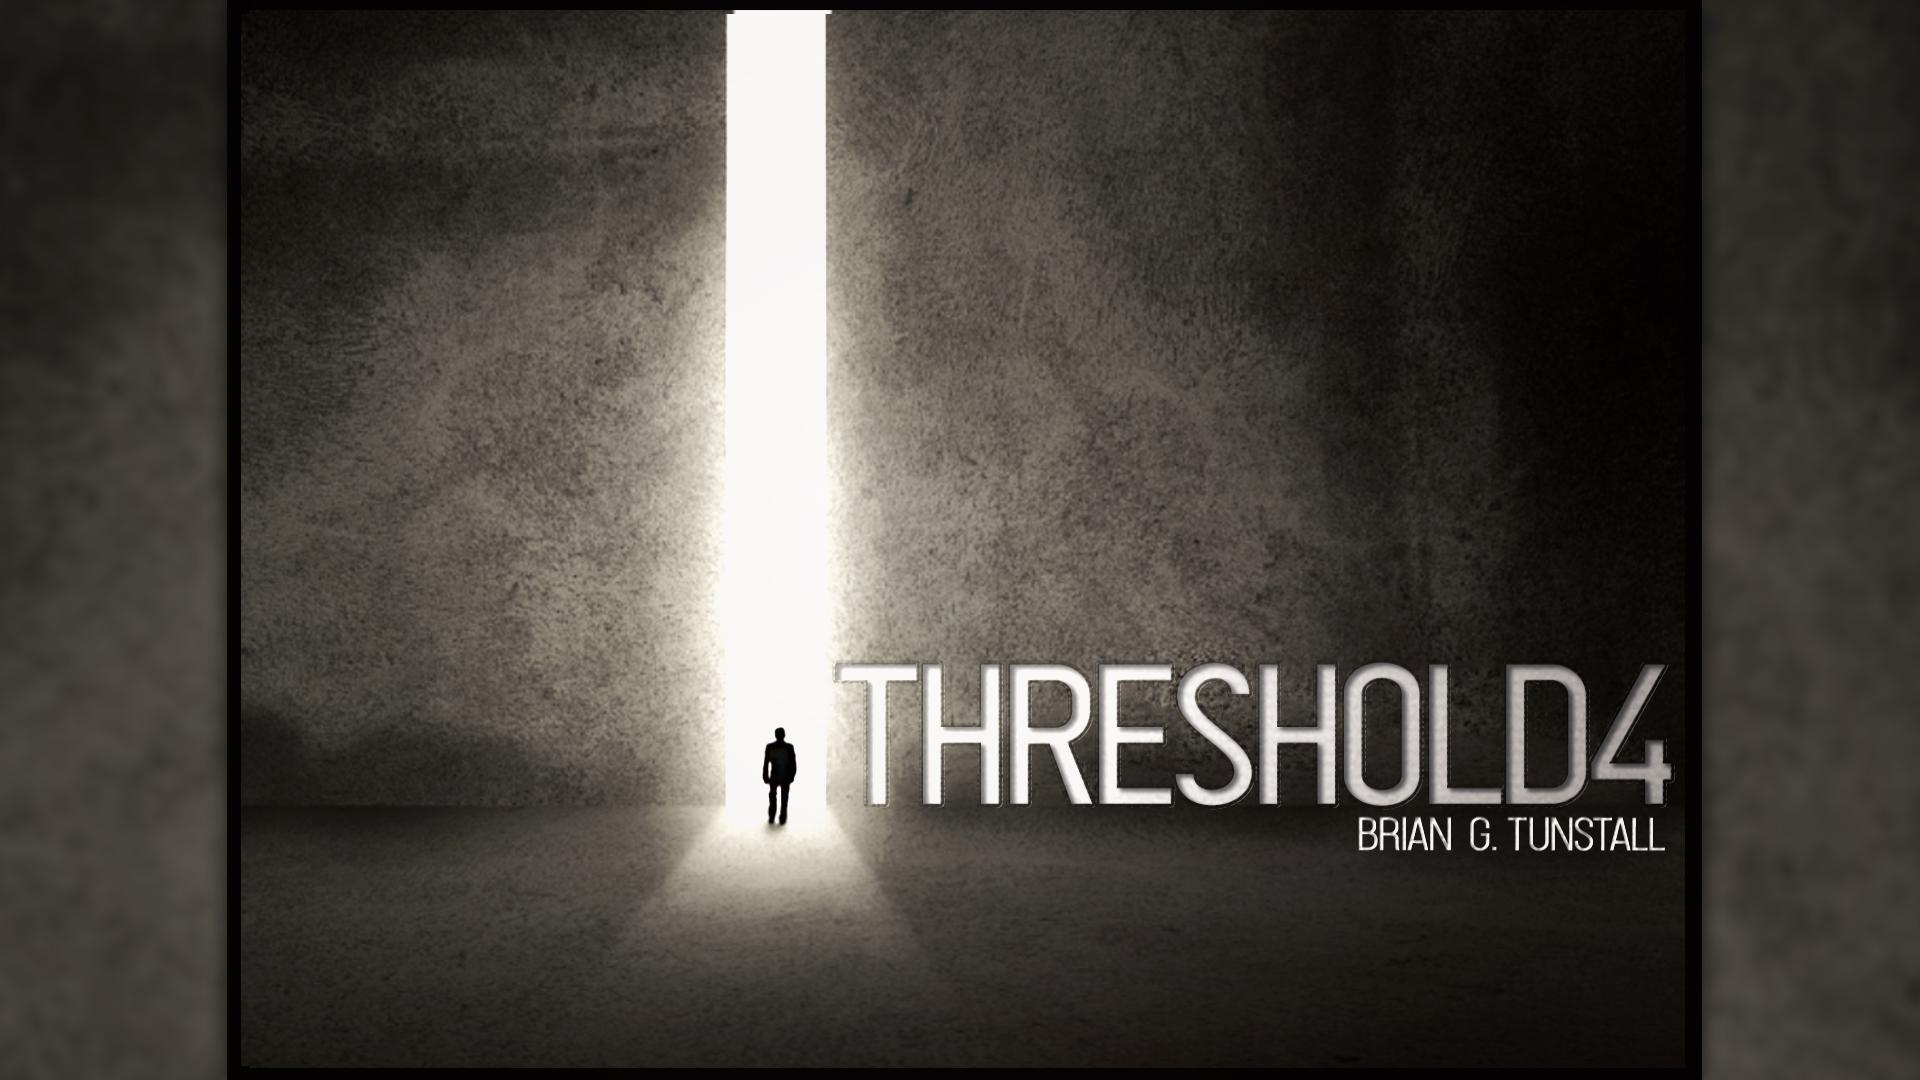 Threshold4 Cover